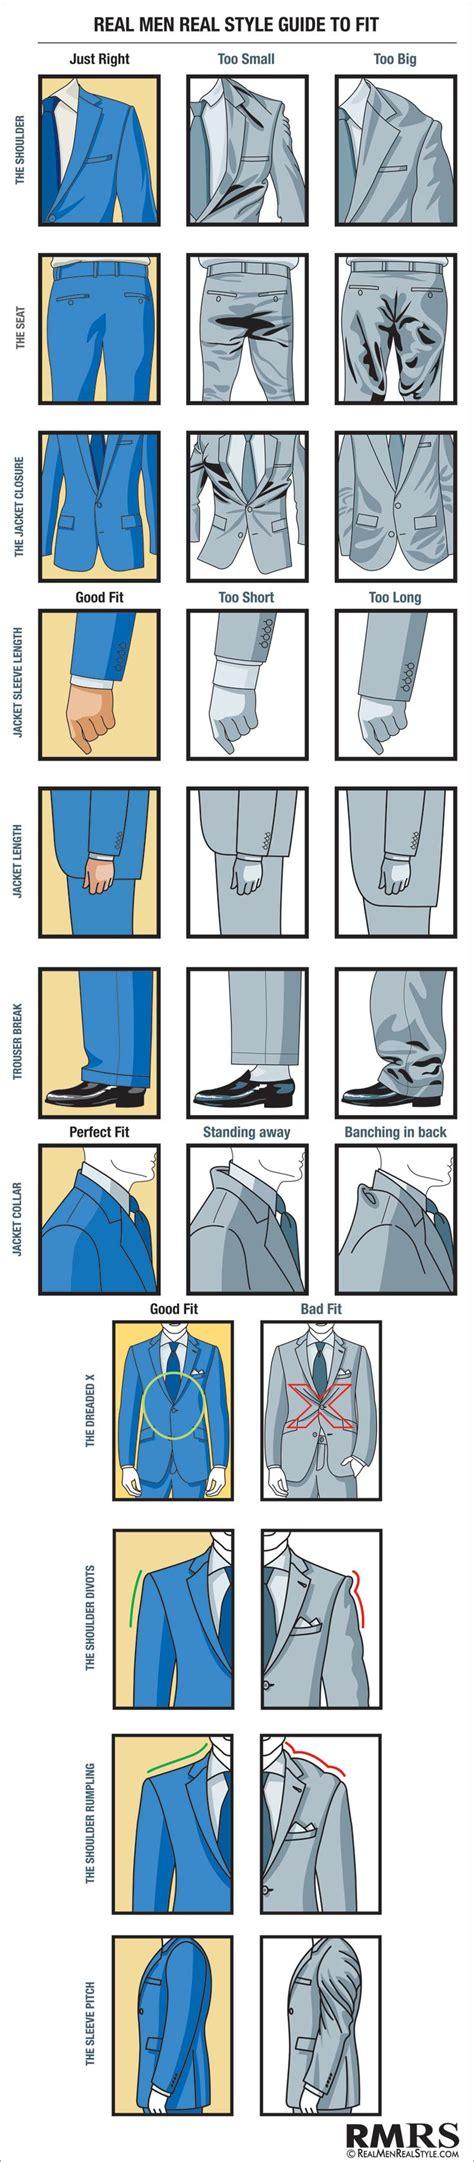 mens suit fit mensfash